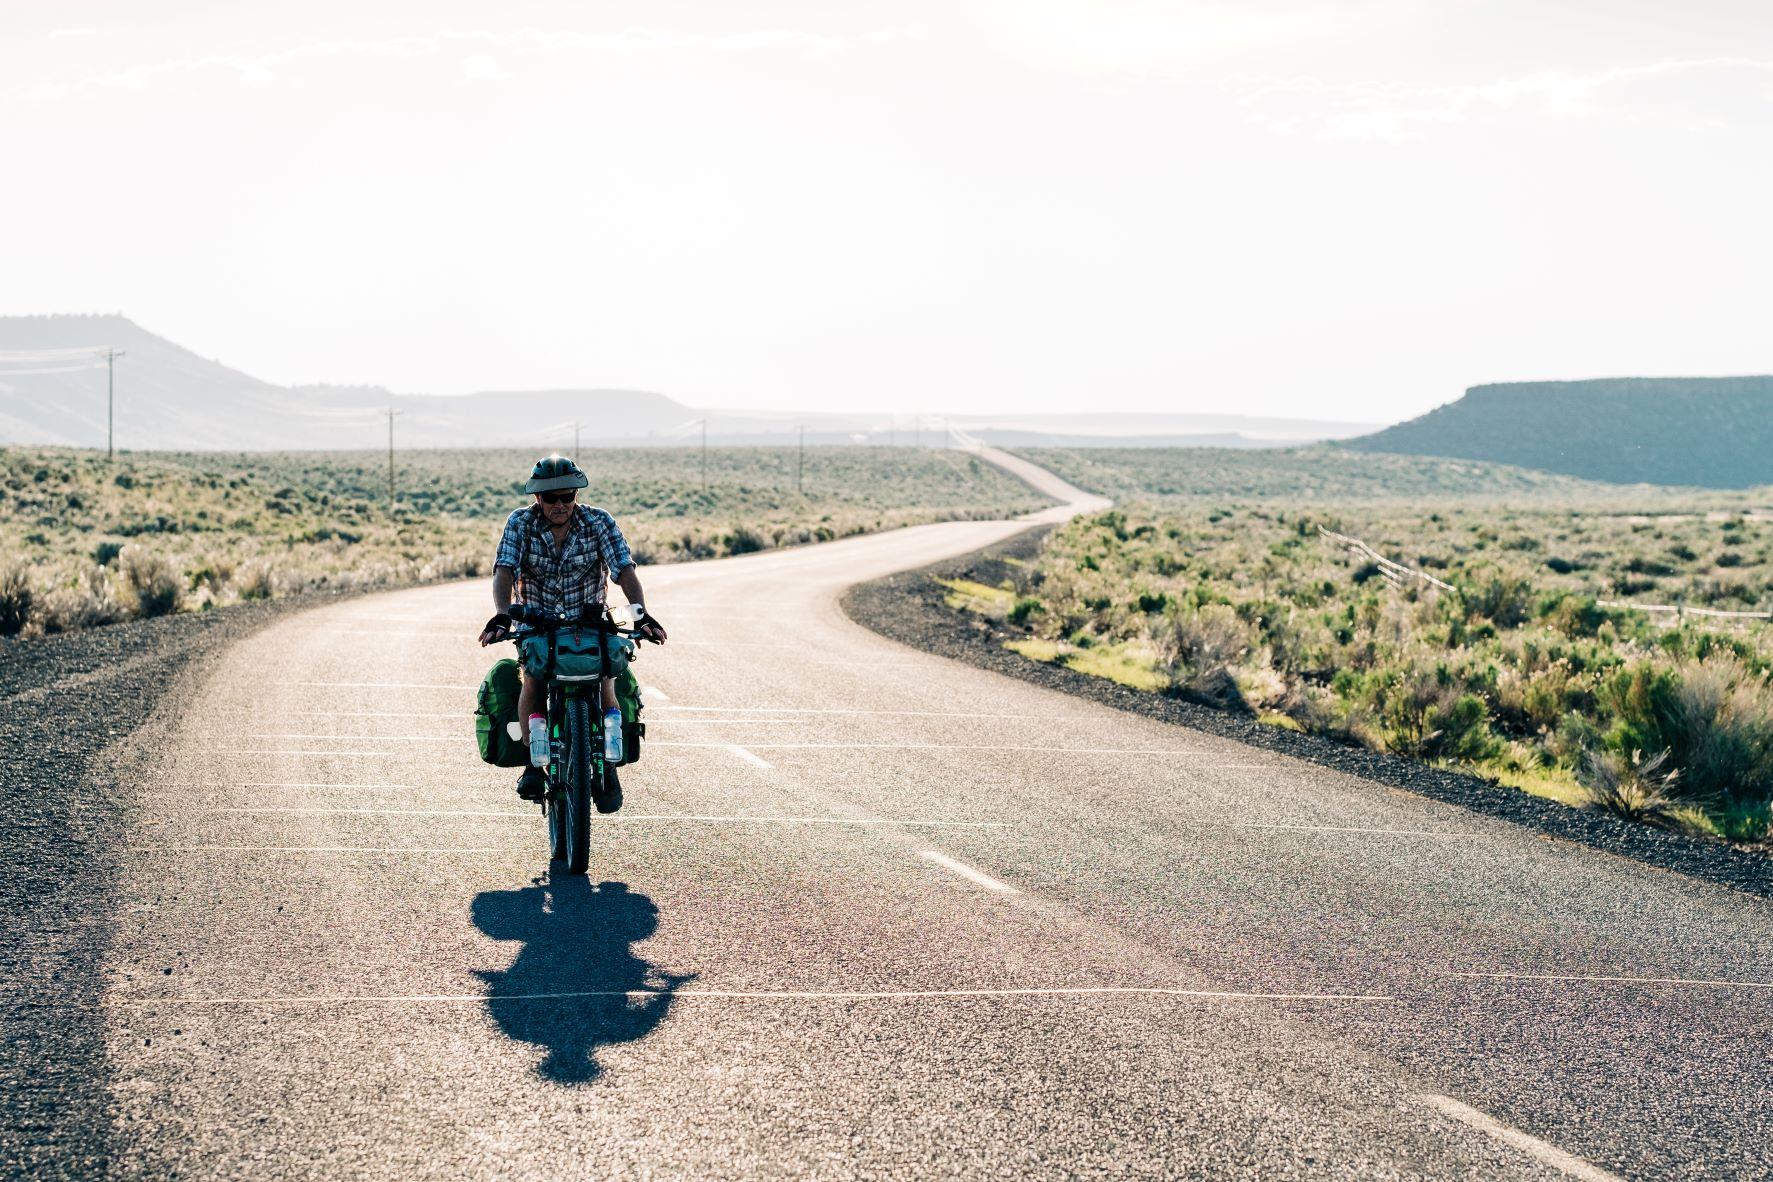 Biking on a paved road through Malheur National Wildlife Refuge in Oregon.